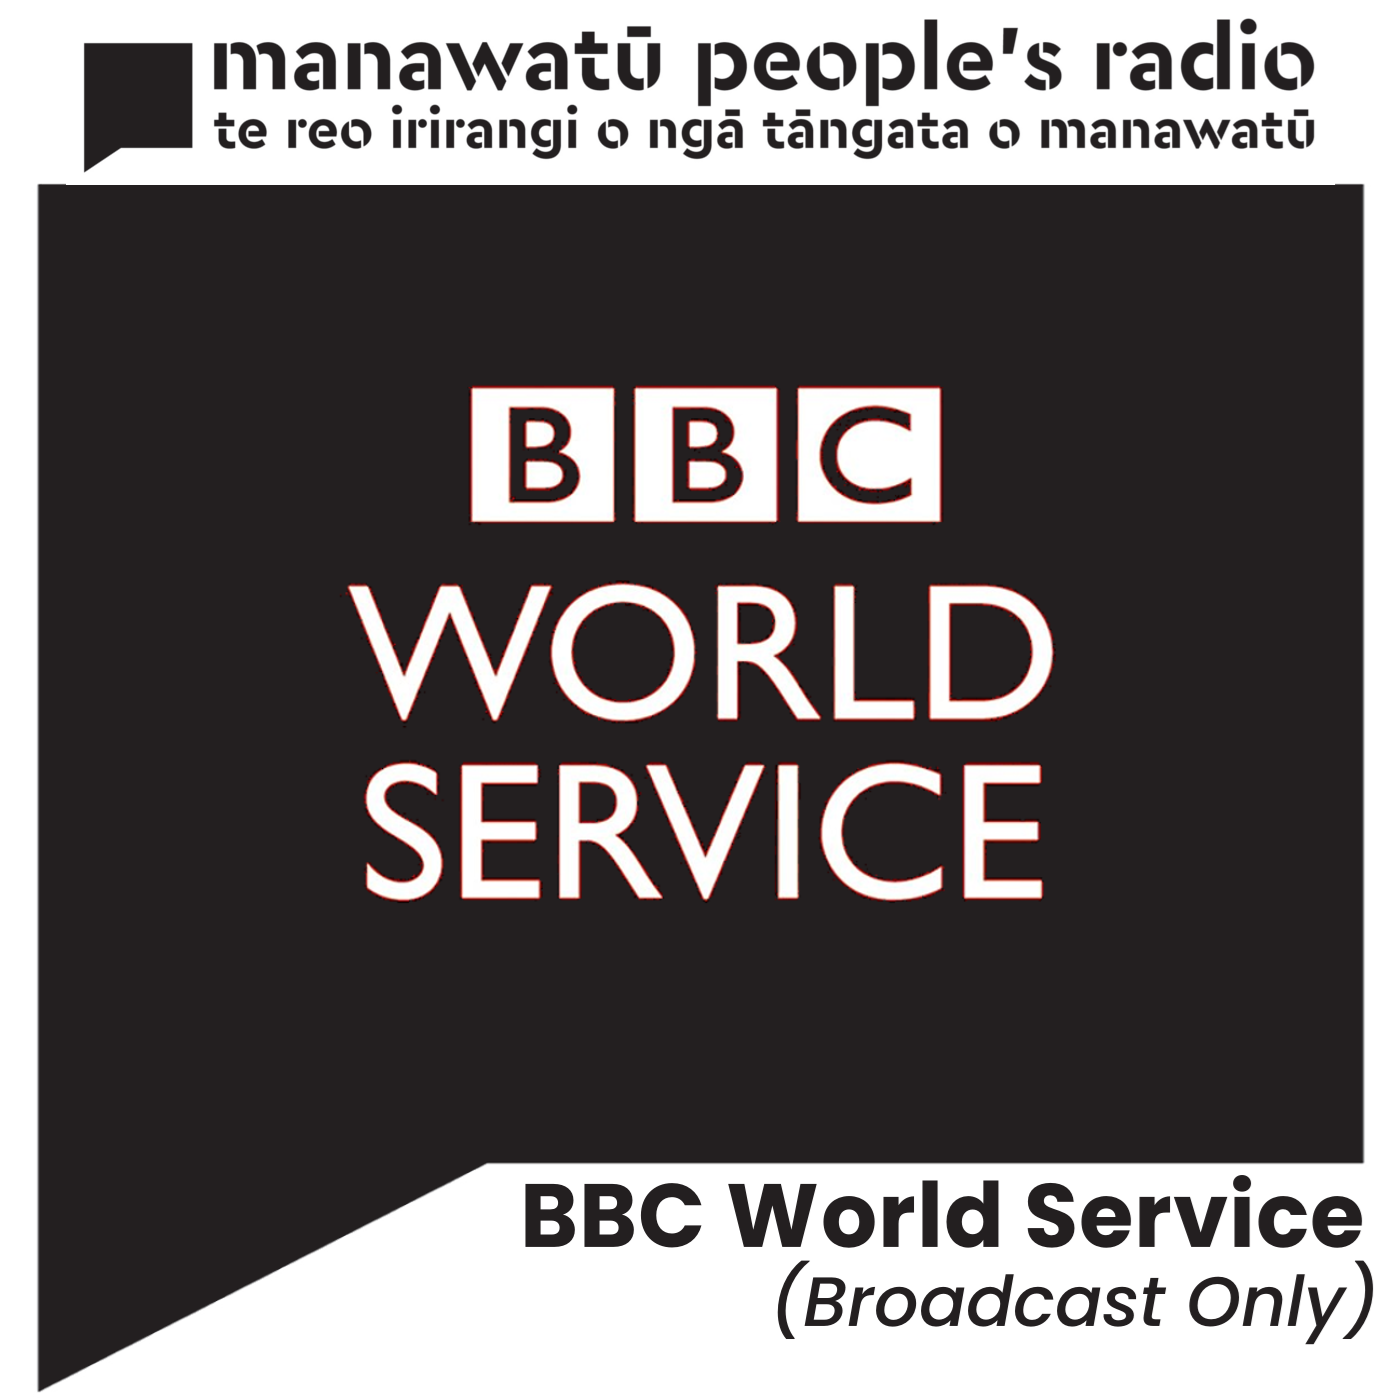 BBC World Service (Broadcast Only)